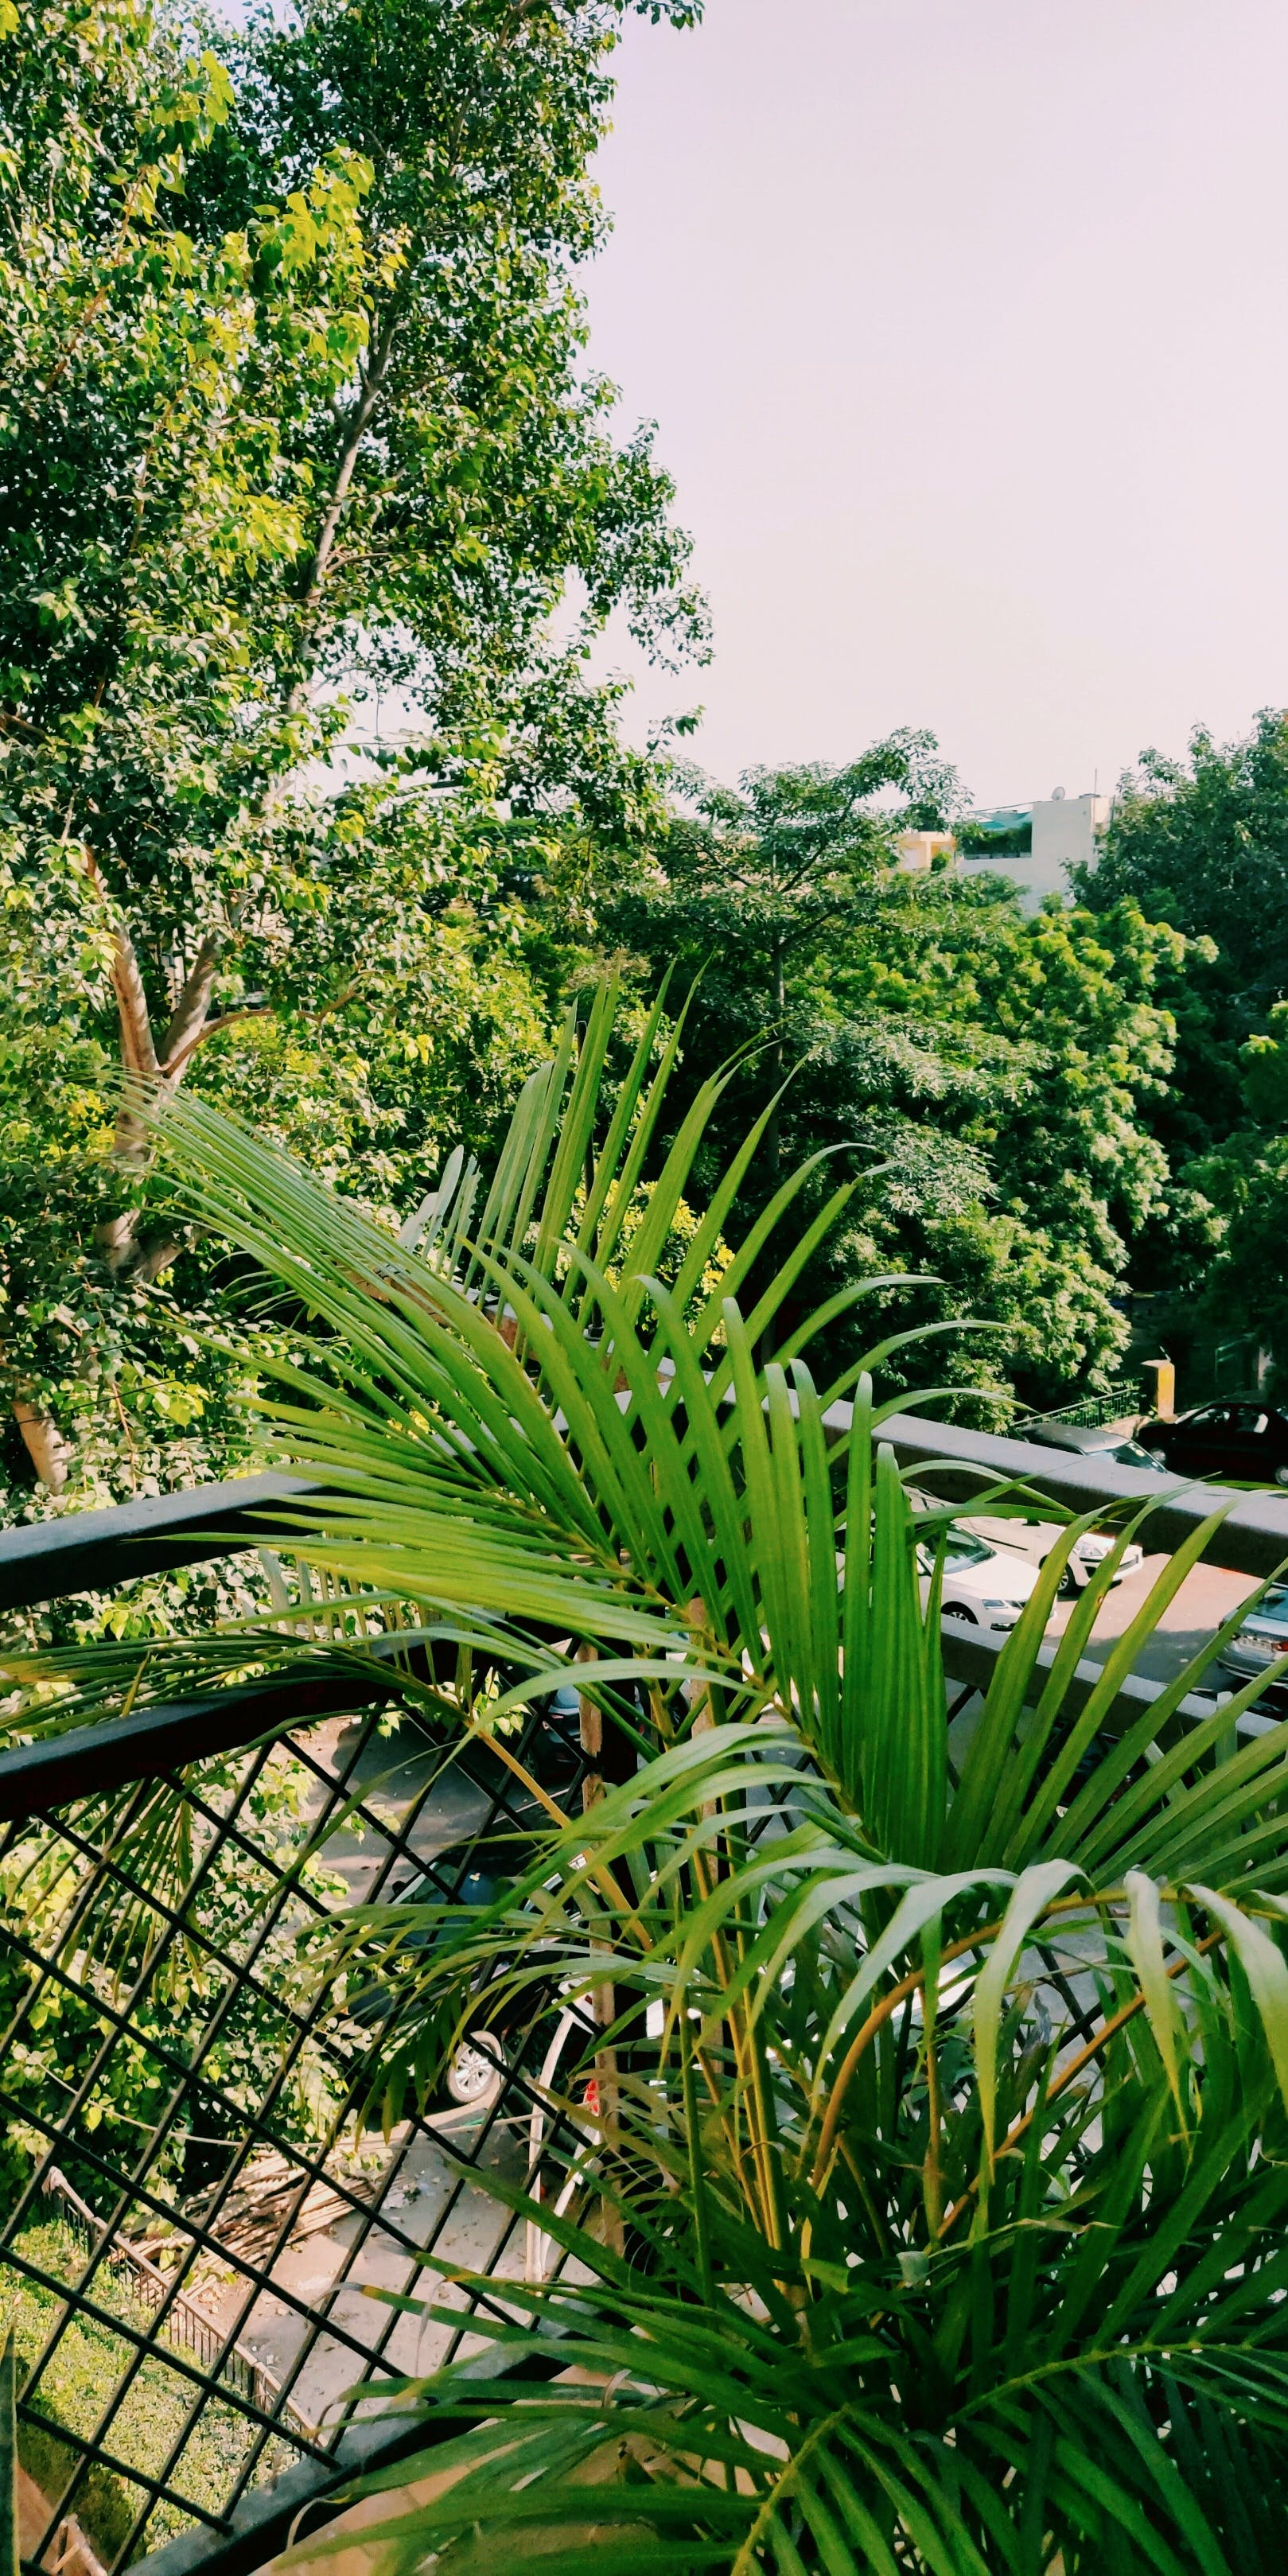 Free stock photo of #green #plants #urban